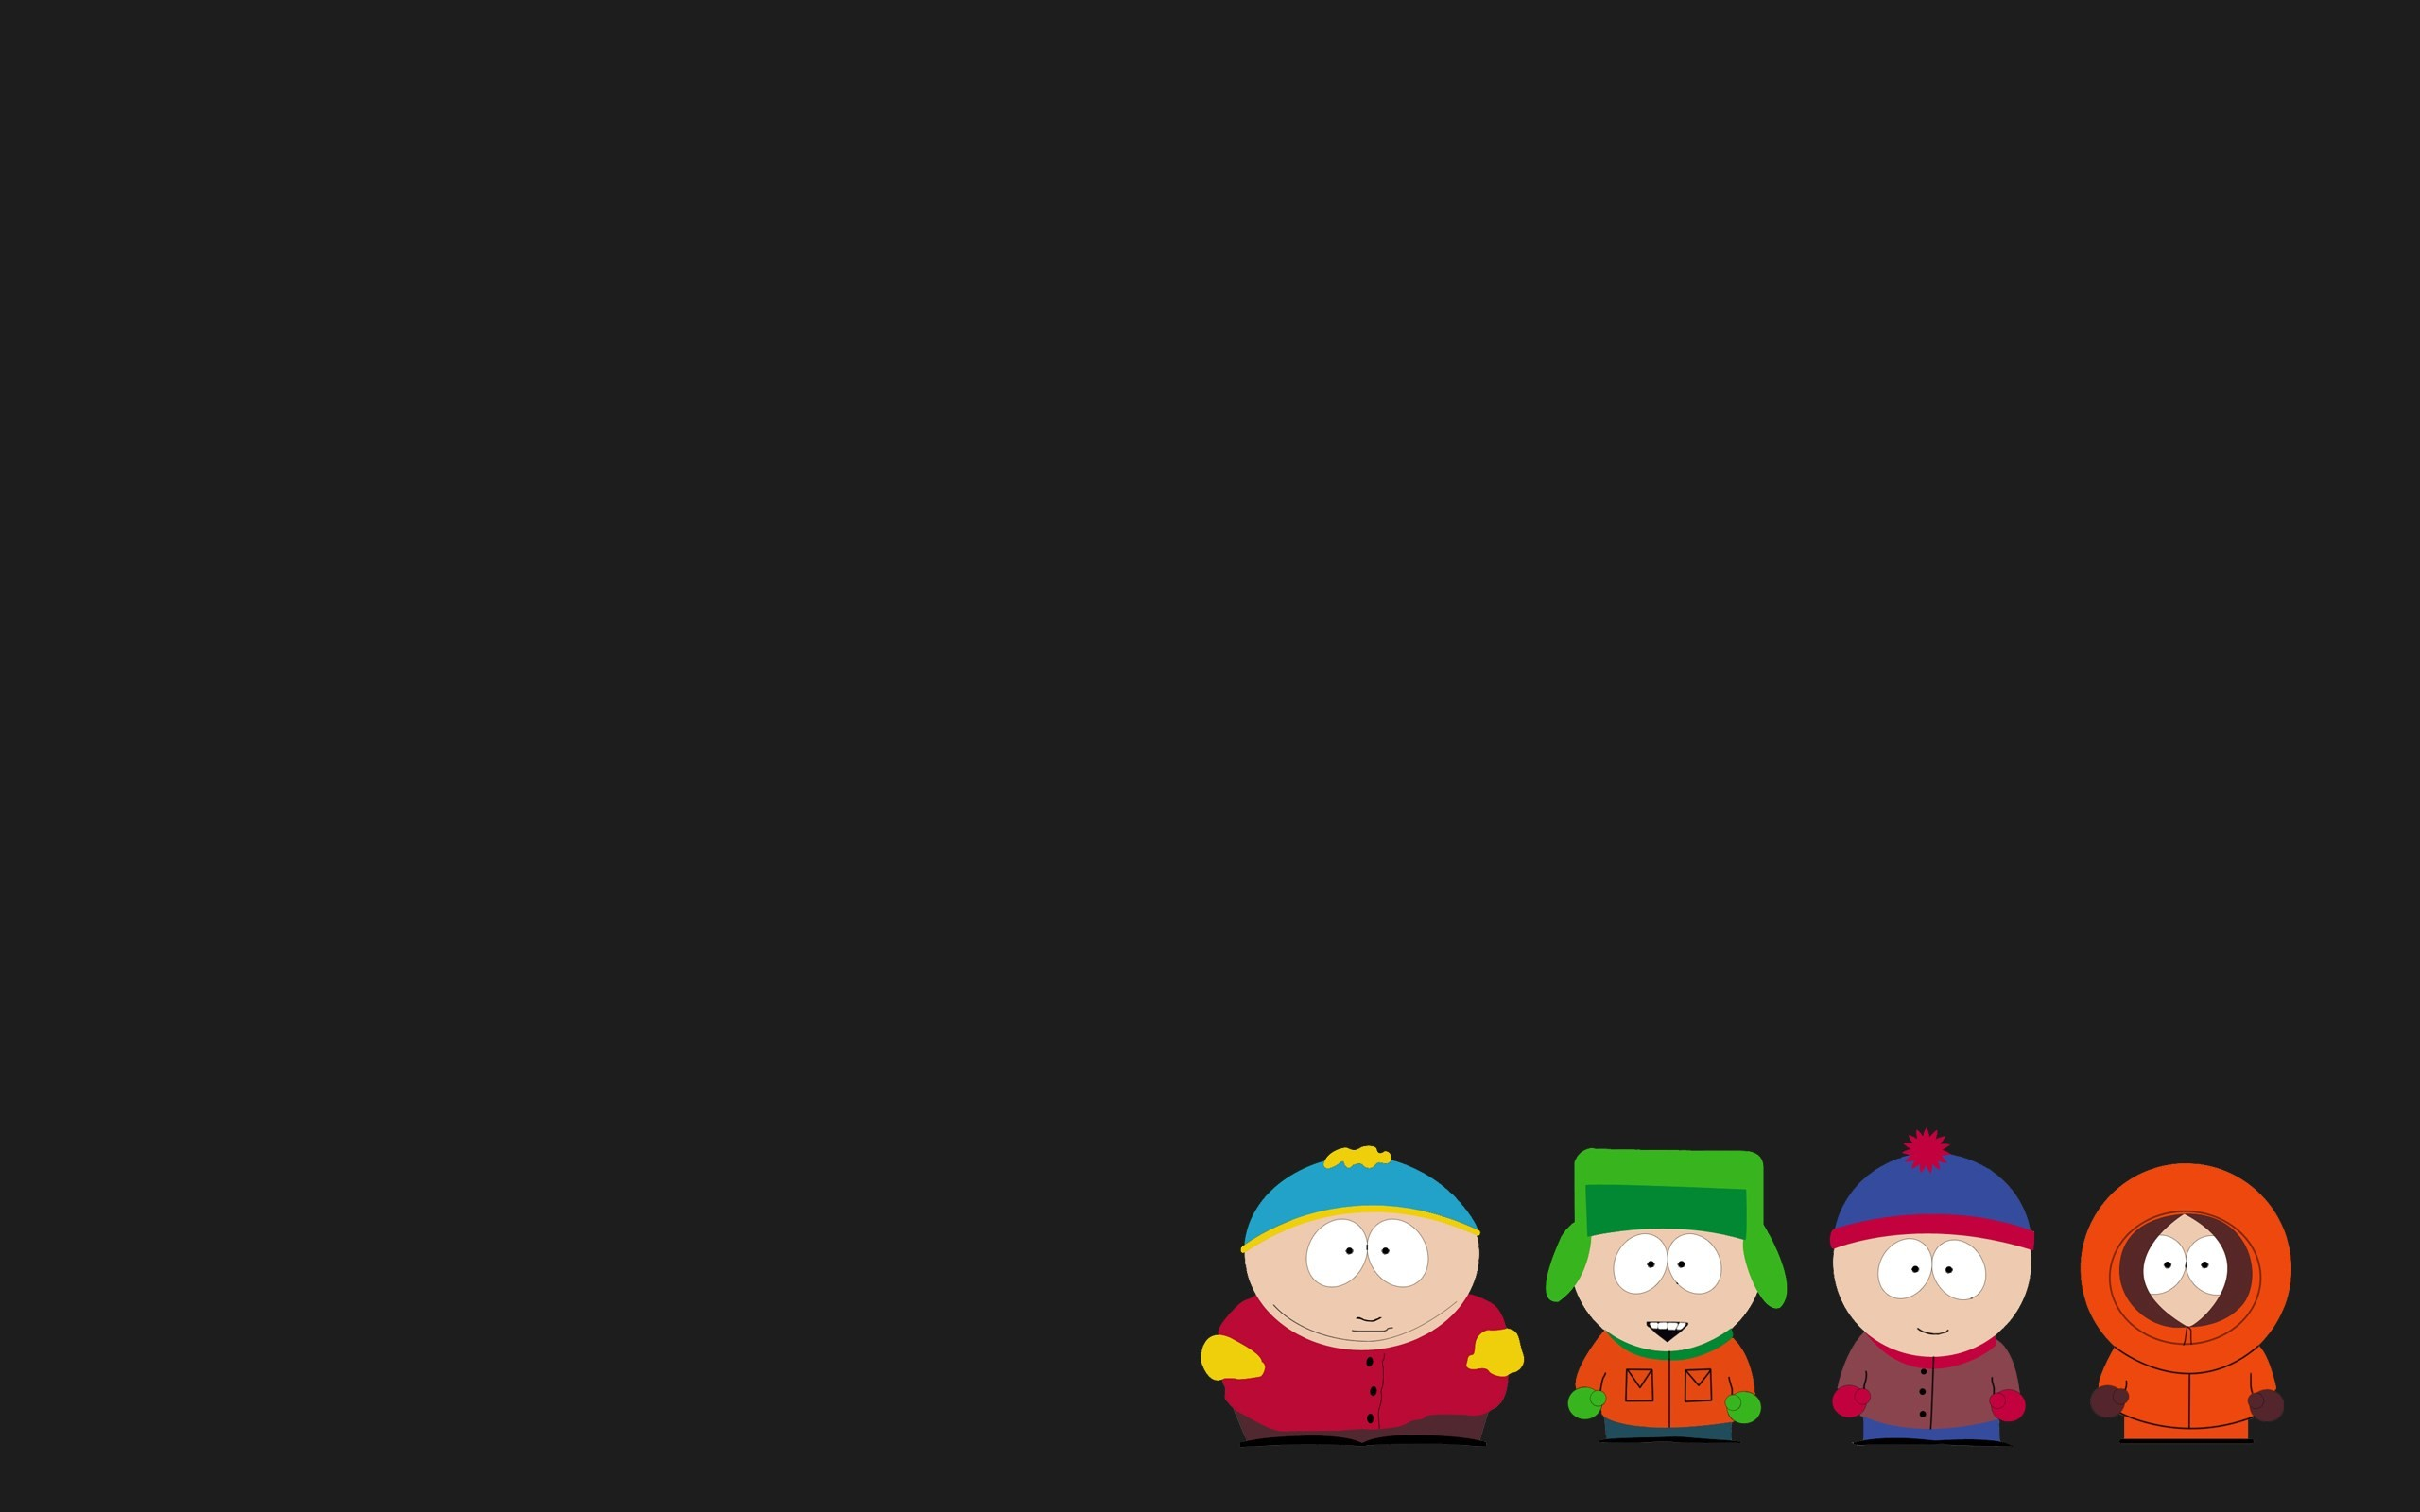 Central Park Iphone 6 Wallpaper South Park Backgrounds 183 ① Wallpapertag